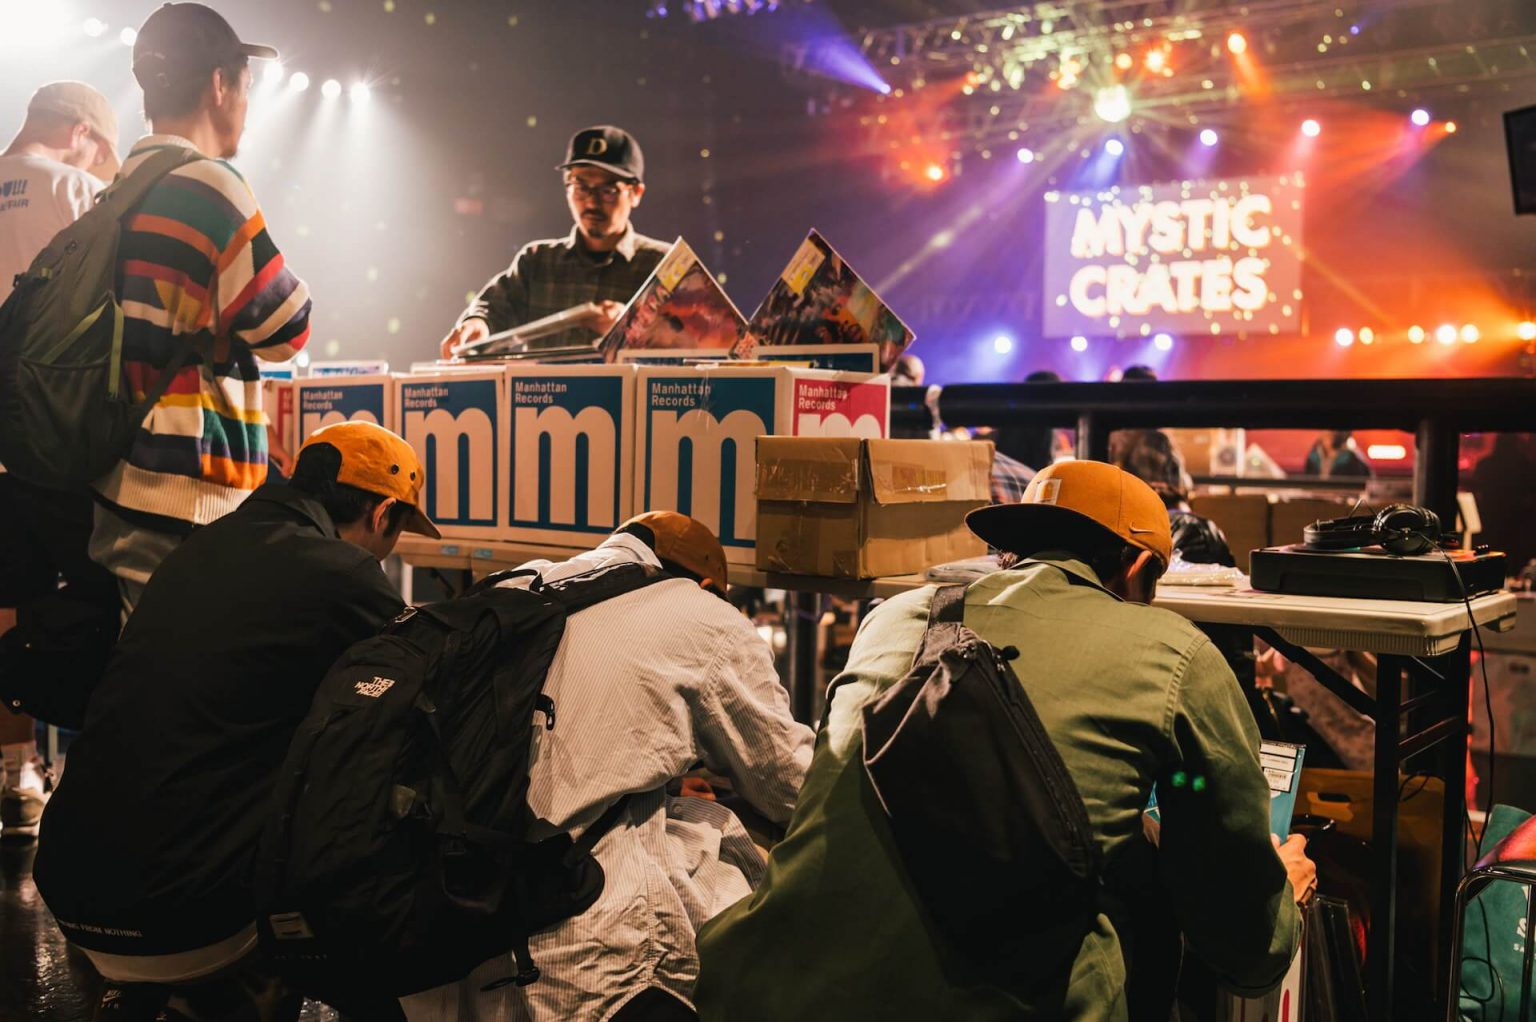 20191102_qetic-al-09-1440x959 レコード市と音楽パフォーマンスを同時に楽しめるレコード・フェス:Discogs Presents Mystic Crates